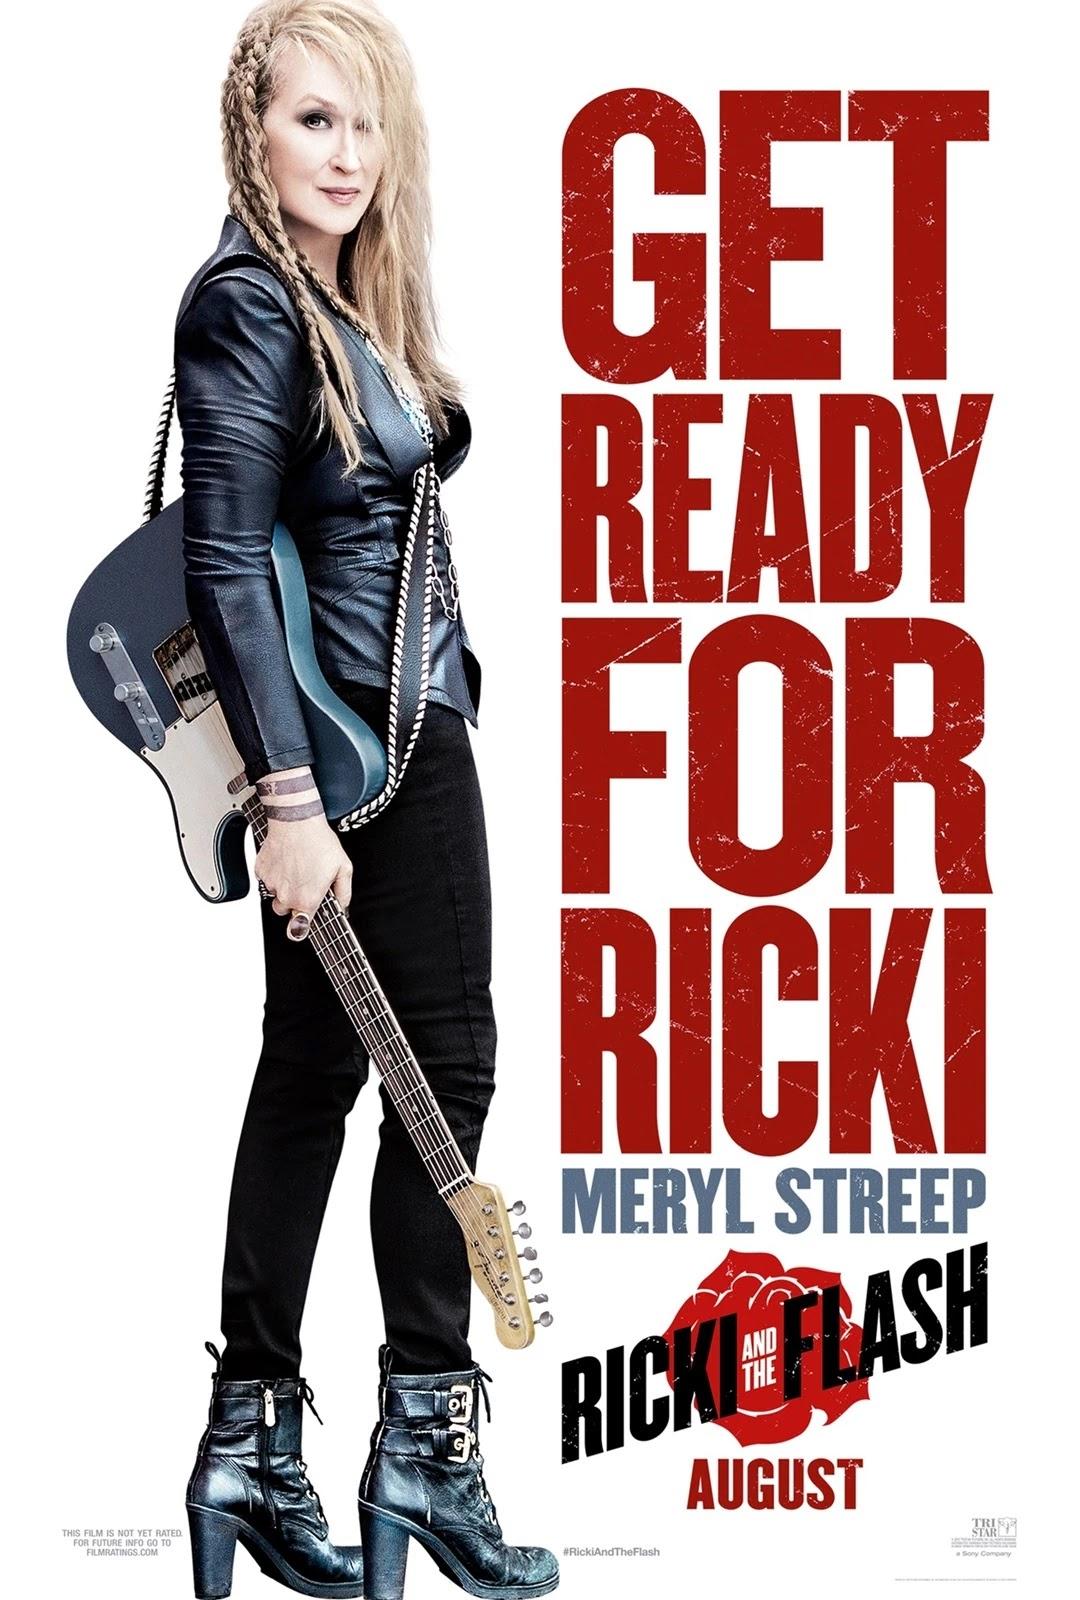 搖滾女王,Ricki and the Flash,搖滾星媽,瑞奇和闪电